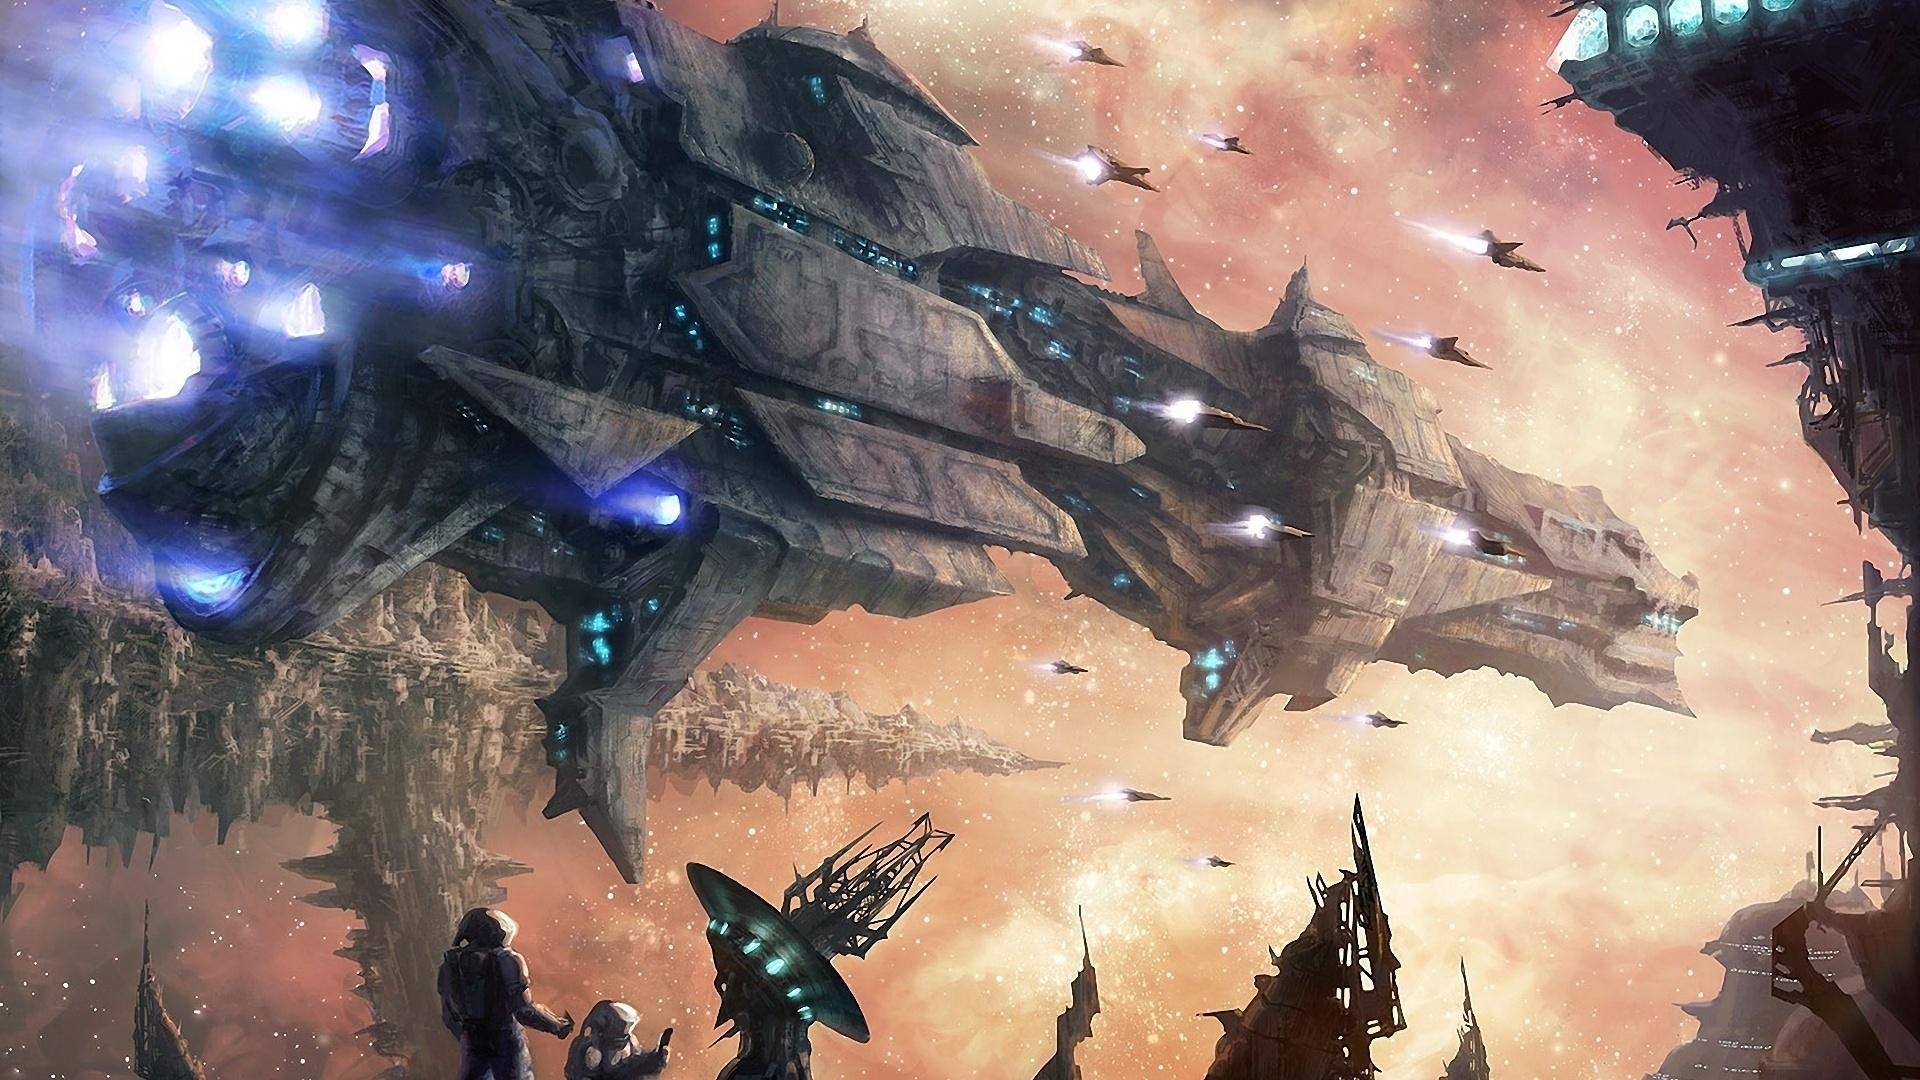 Spaceships Art wallpaper photo hd